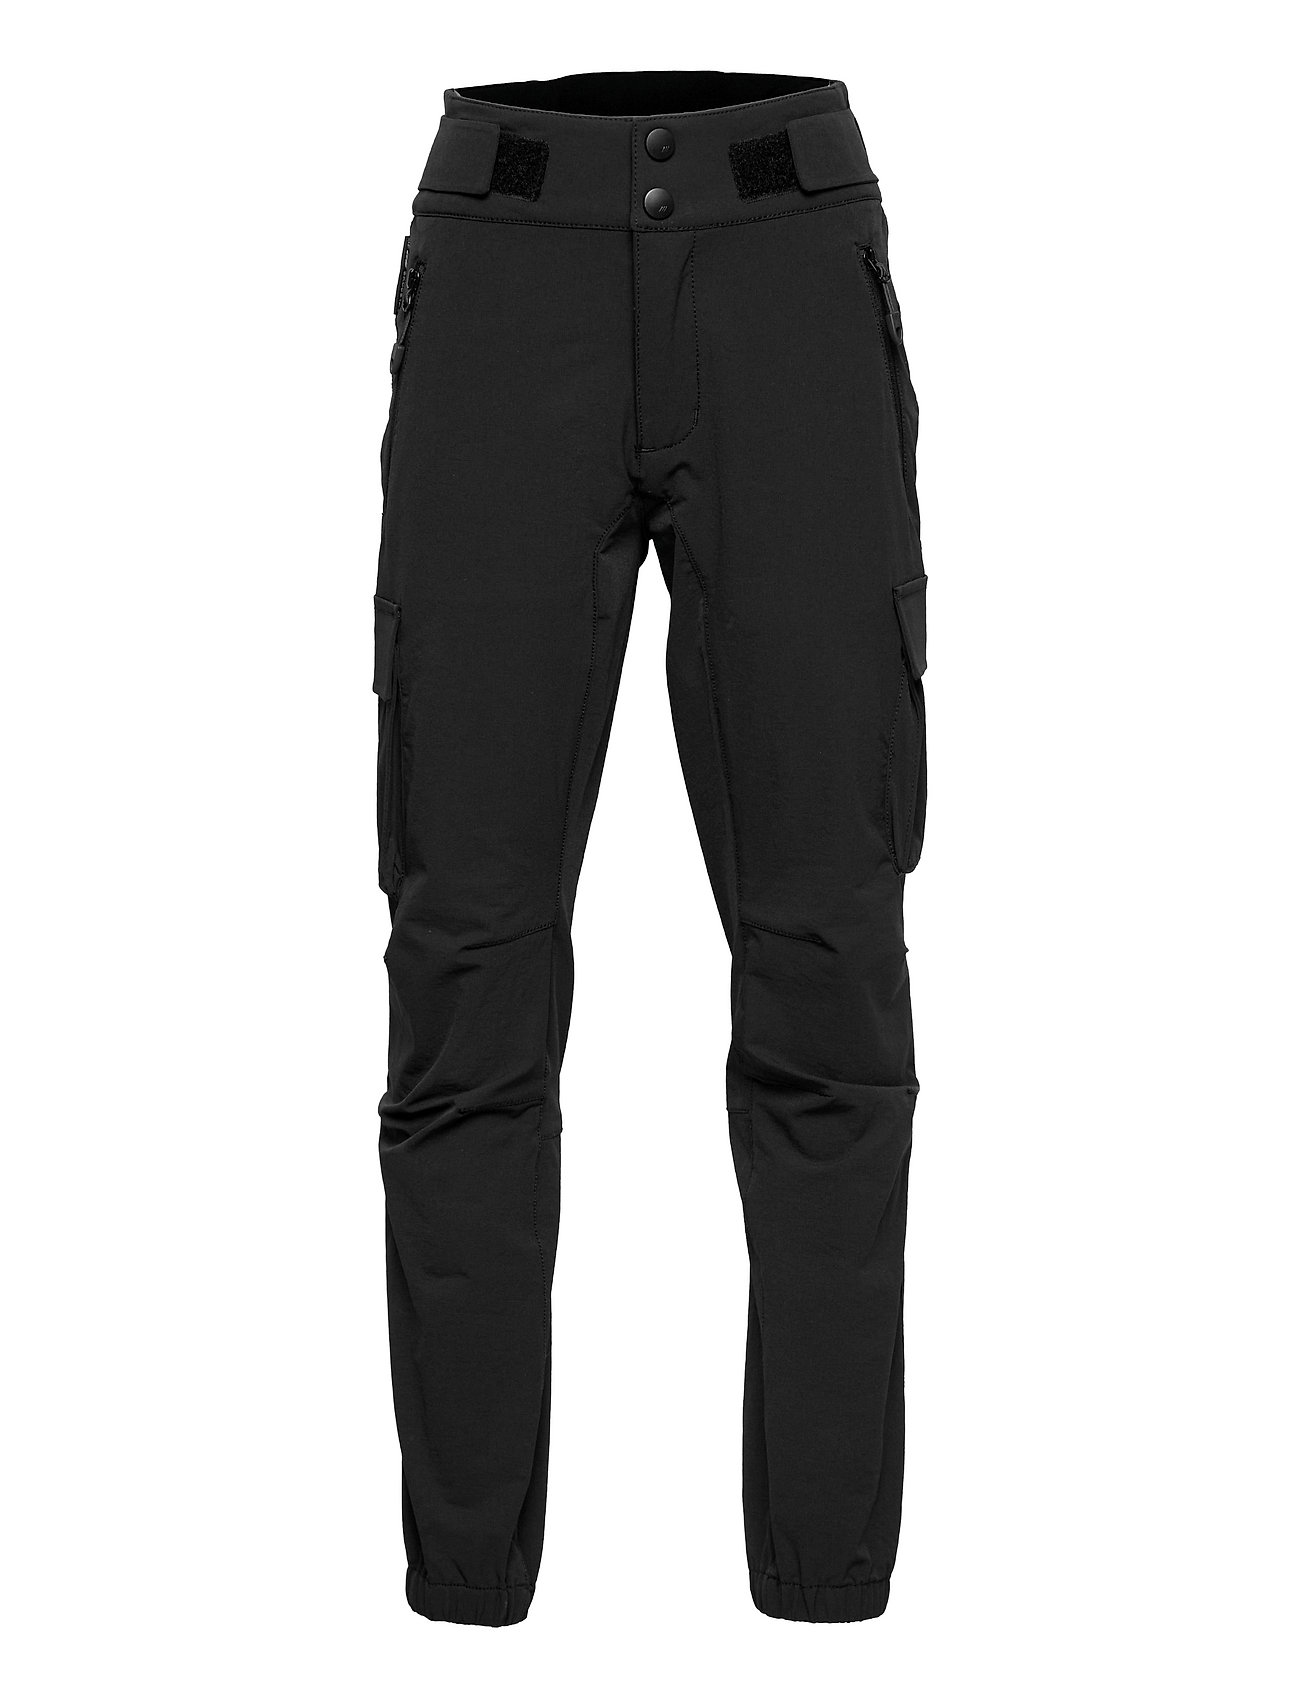 IstrehåGen Hiking Trousers Outerwear Softshells Softshell Trousers Sort Skogstad